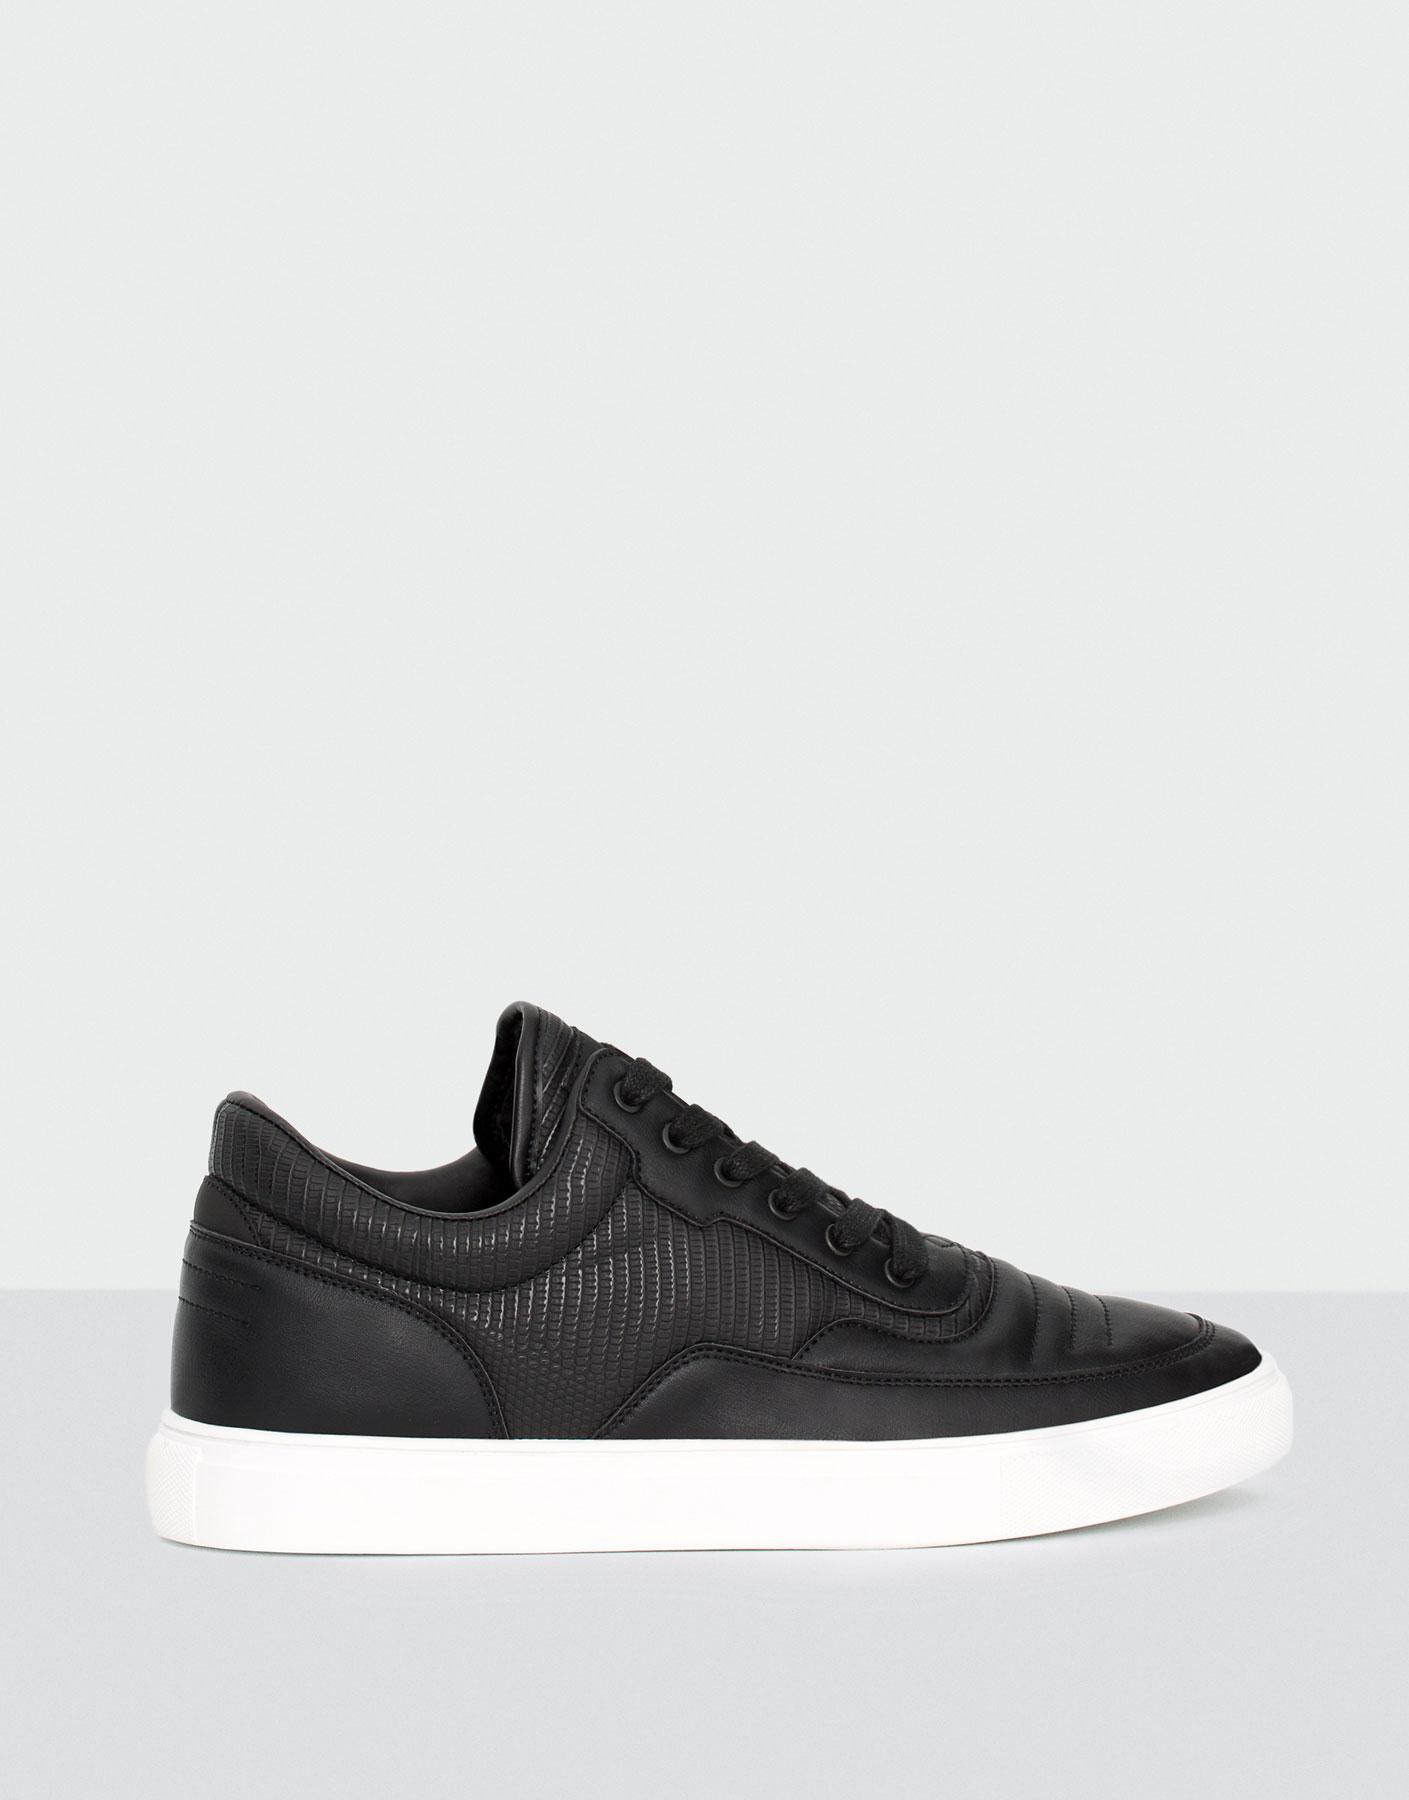 Black sneaker boots